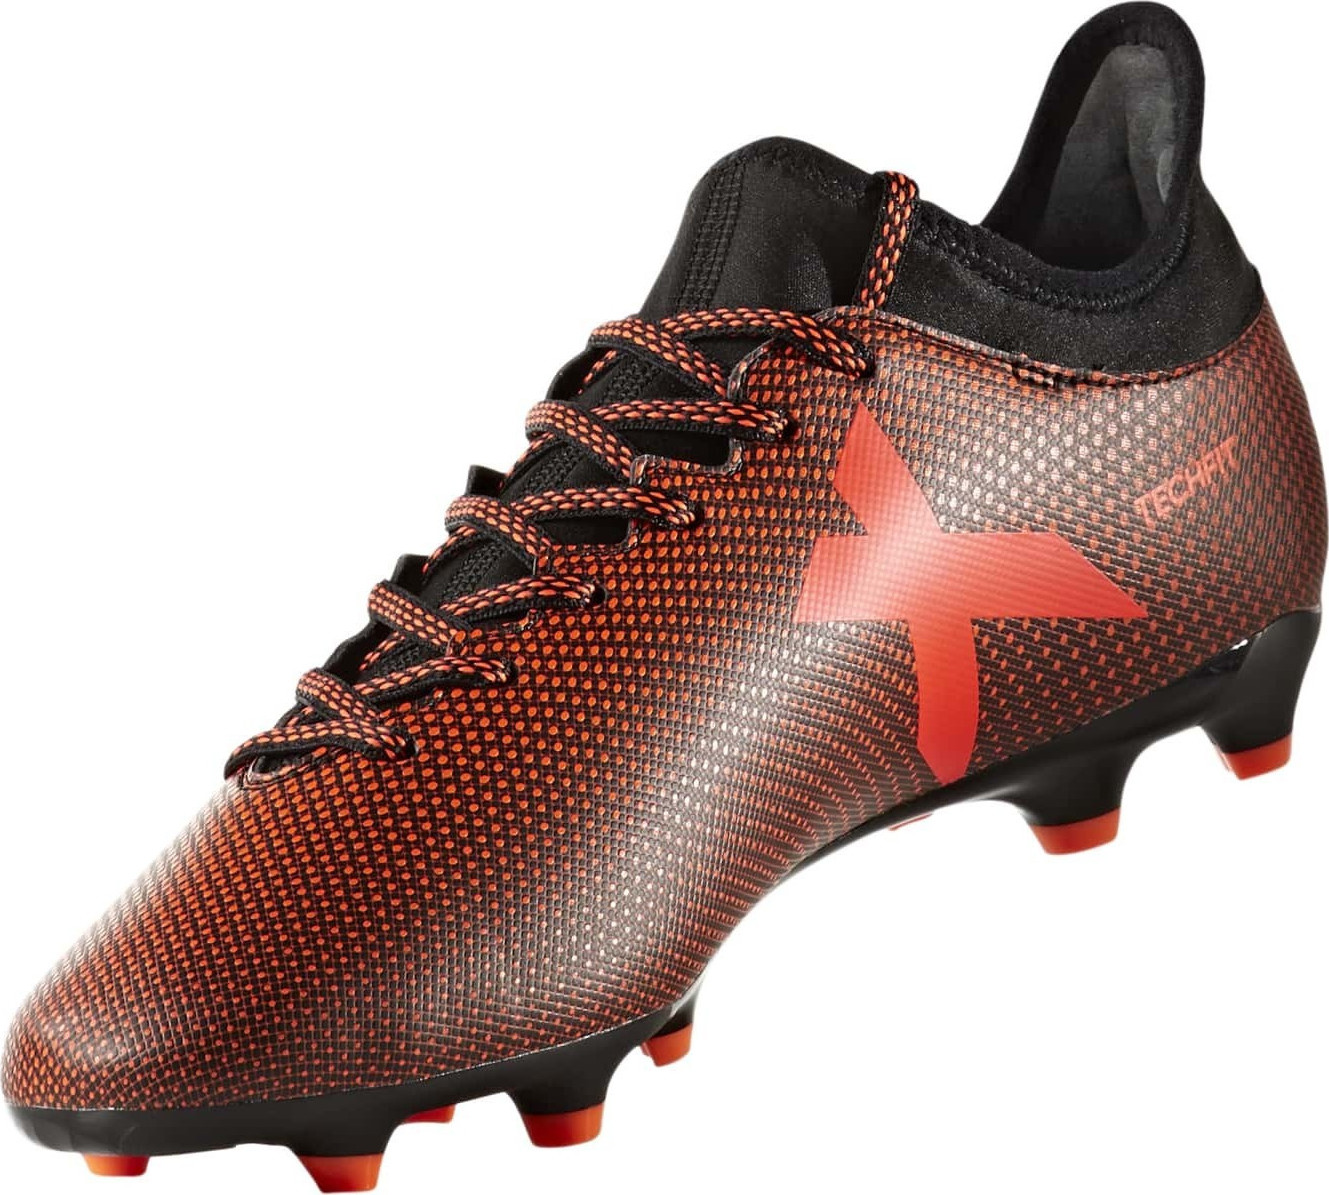 Adidas X 17.3 Firm Ground Boots S82365 - Skroutz.gr cad60a427b6